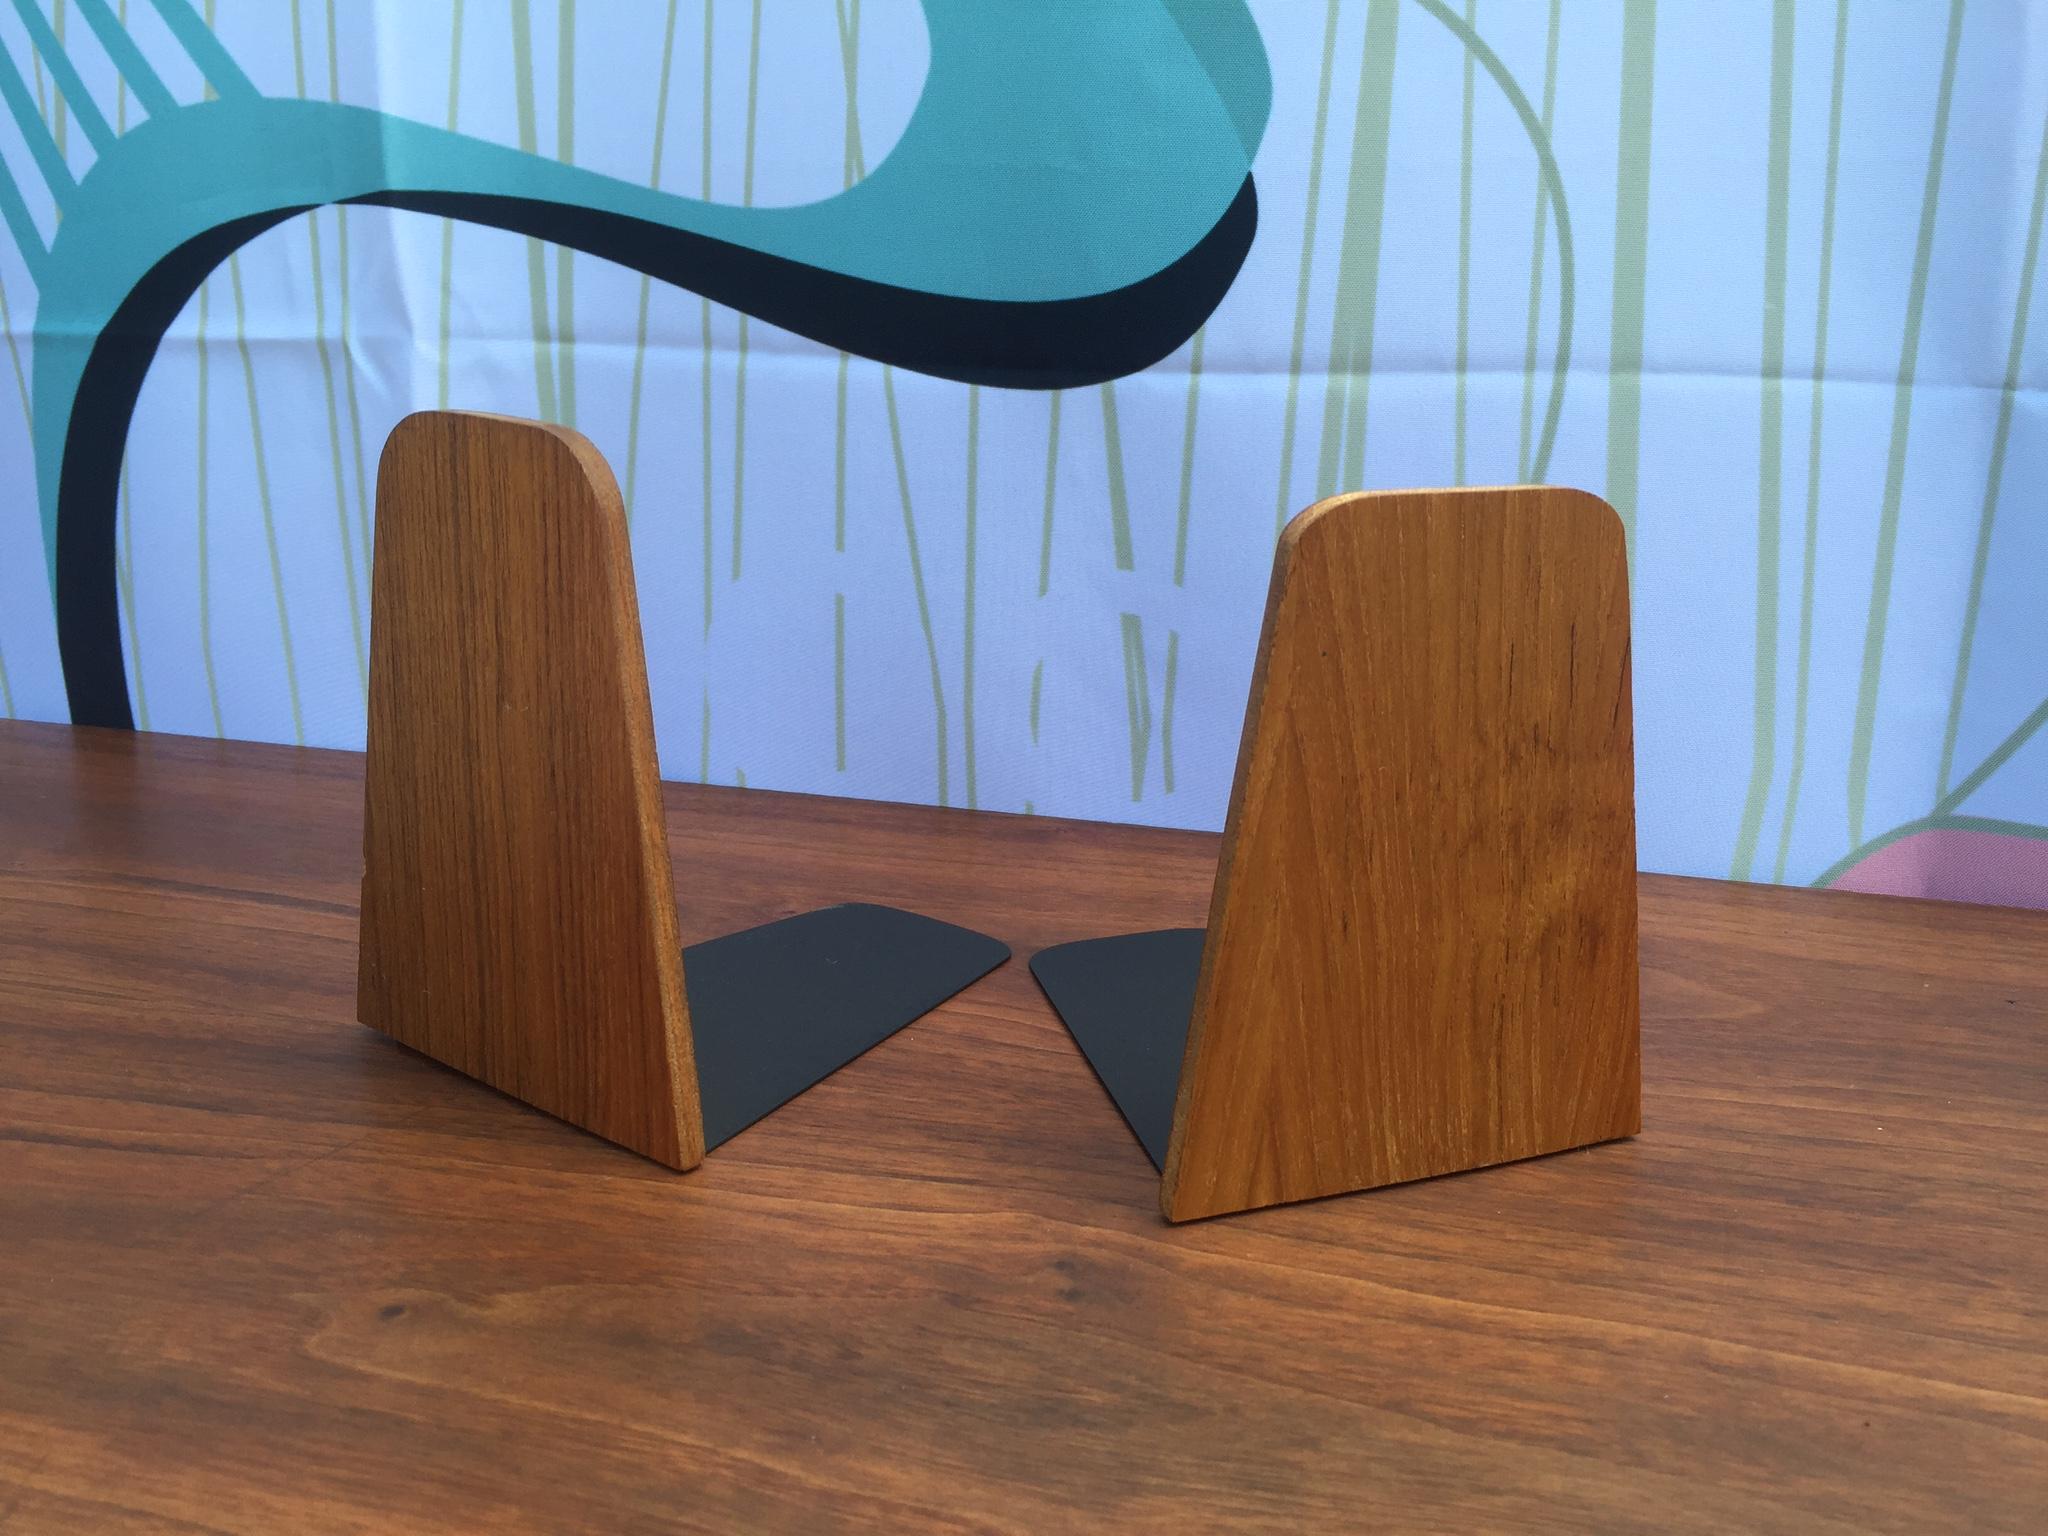 excellent mid century modern bedroom referencias san and | Danish Modern Teak Bookends | Modern Flamingo